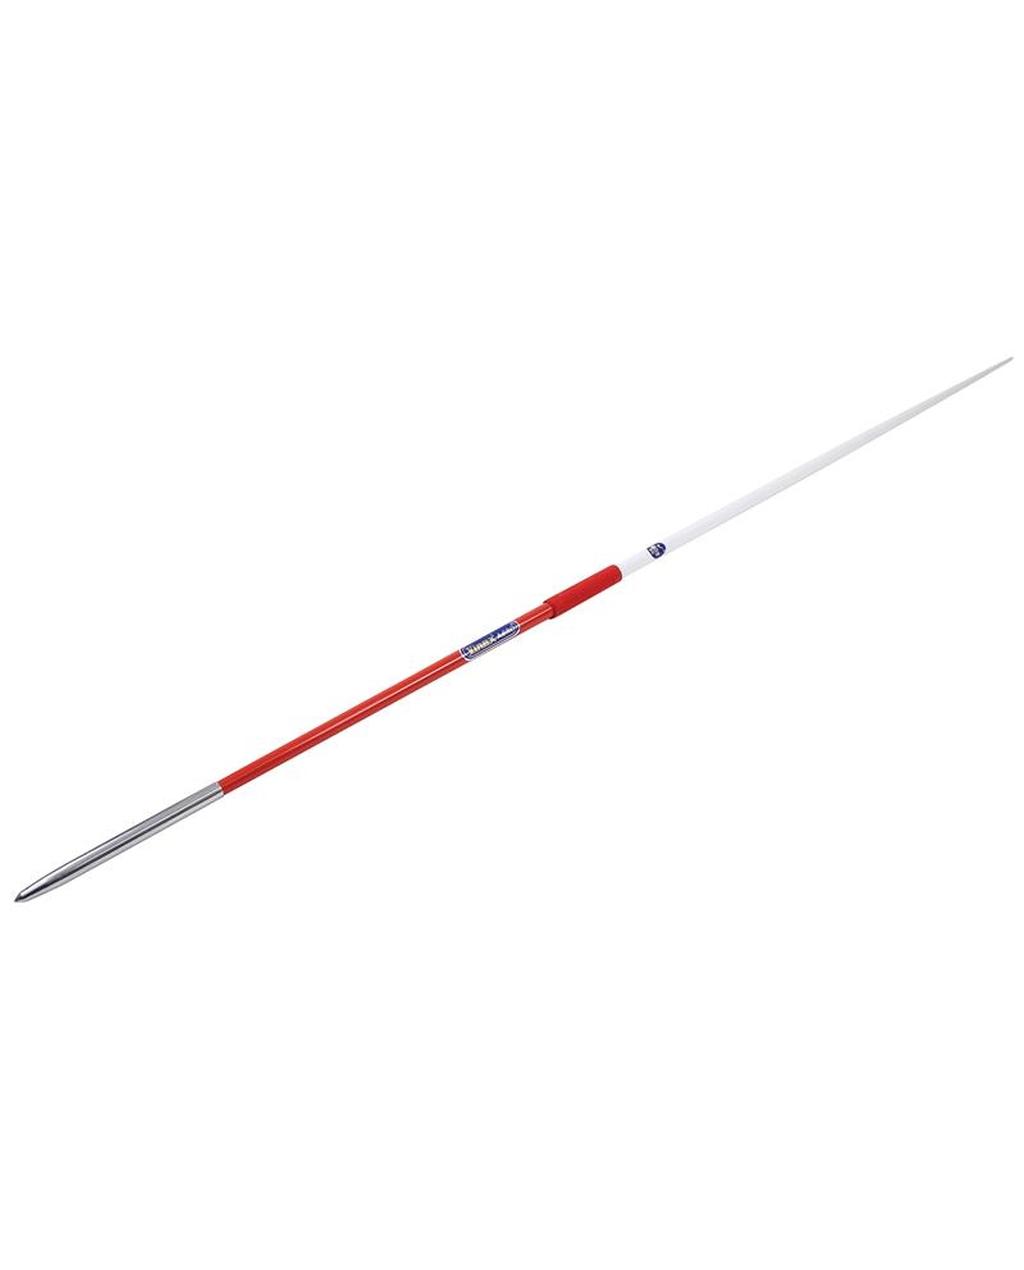 Aero Javelin - 500gr